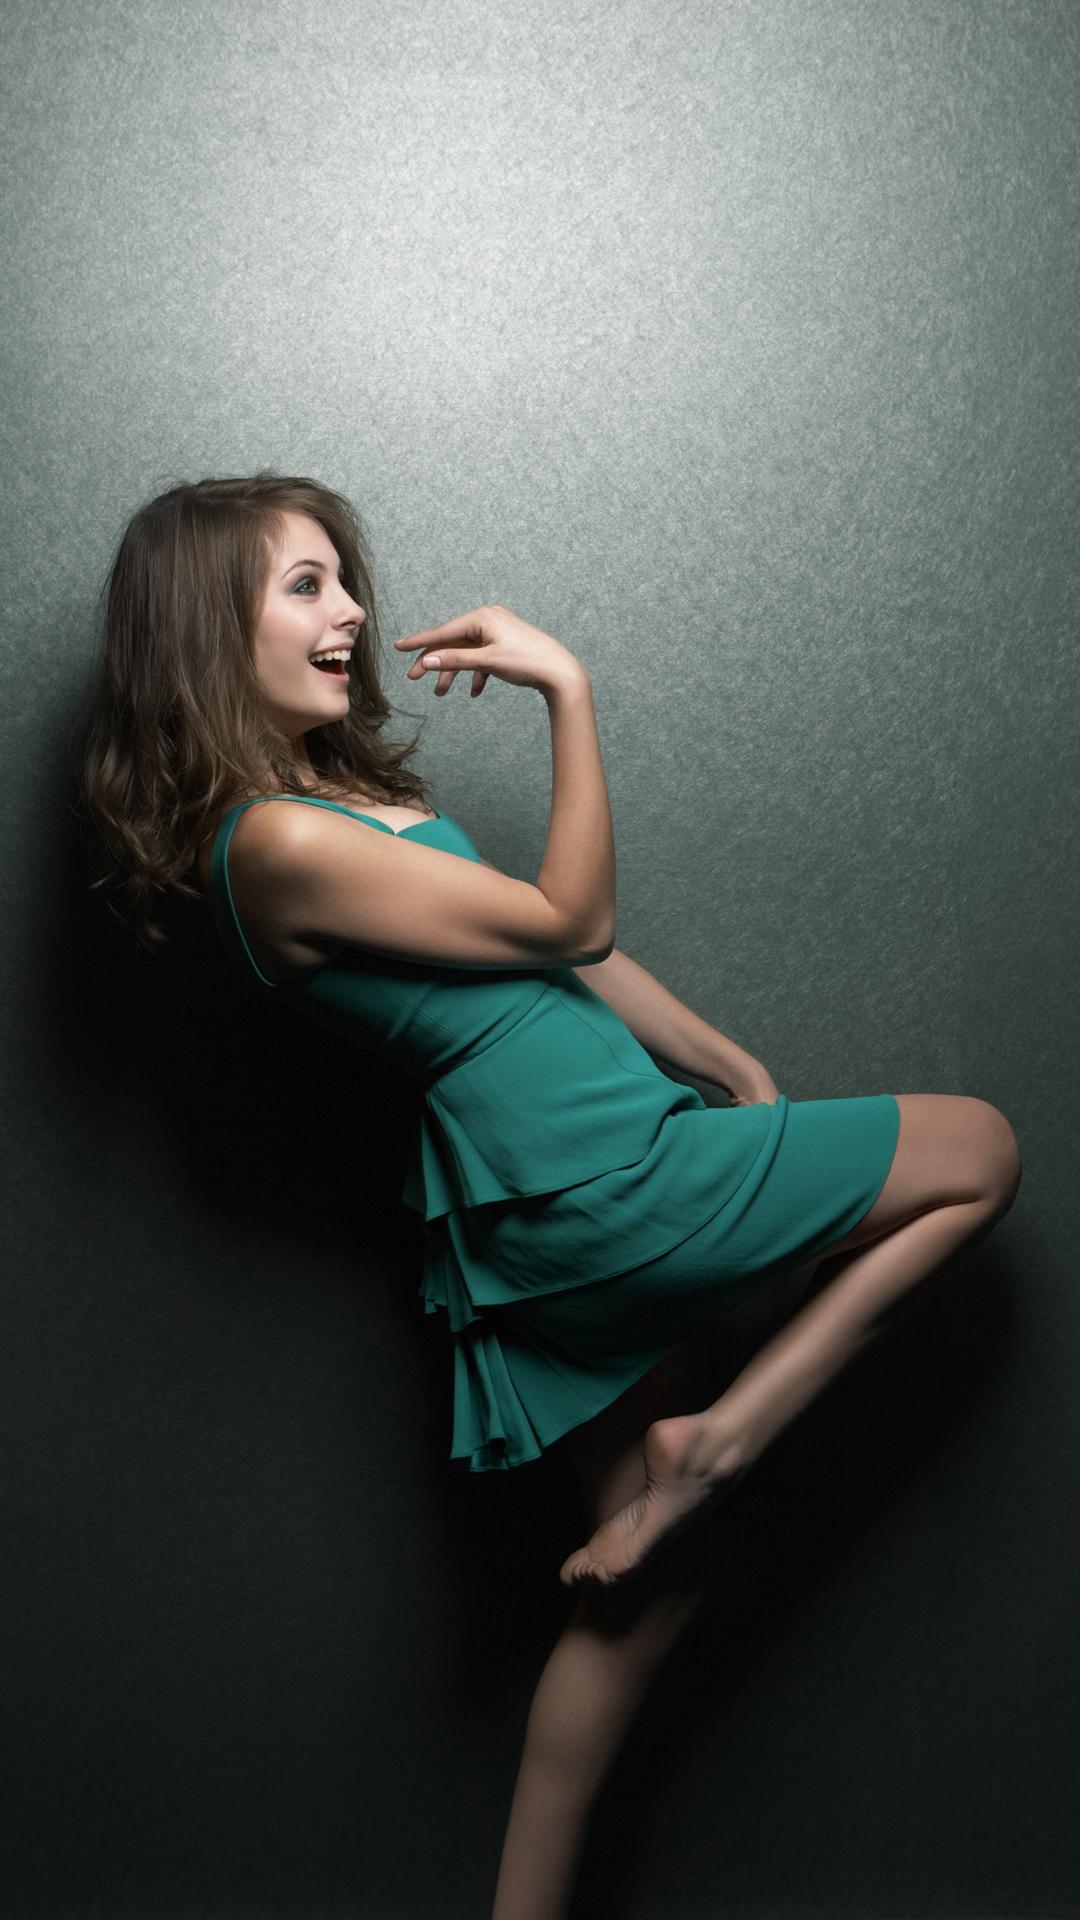 Beautiful girl htc one wallpaper